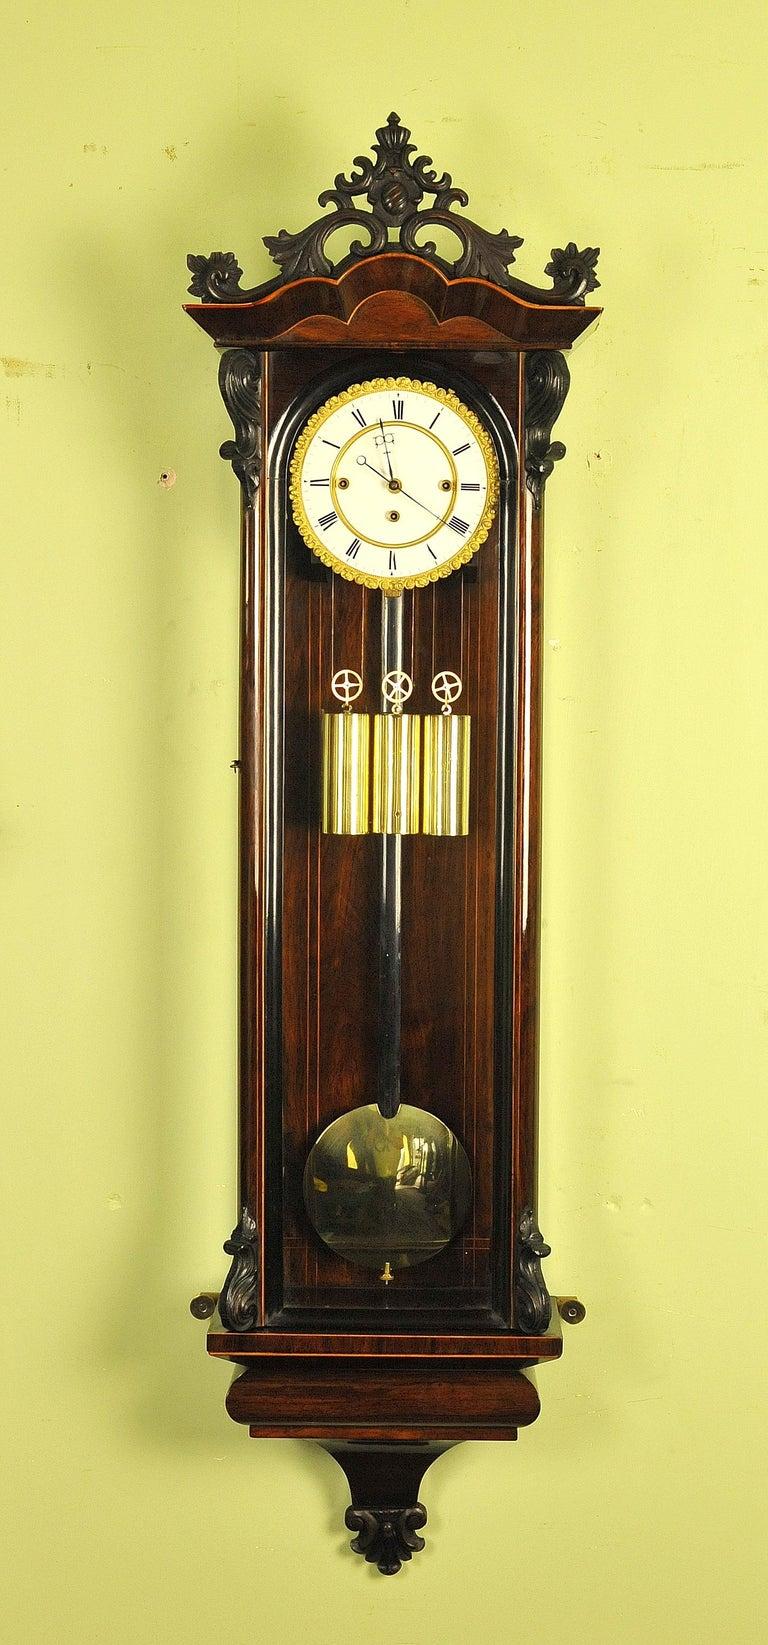 Vienna Regulator Wall Clock, Grande Sonnierre For Sale at